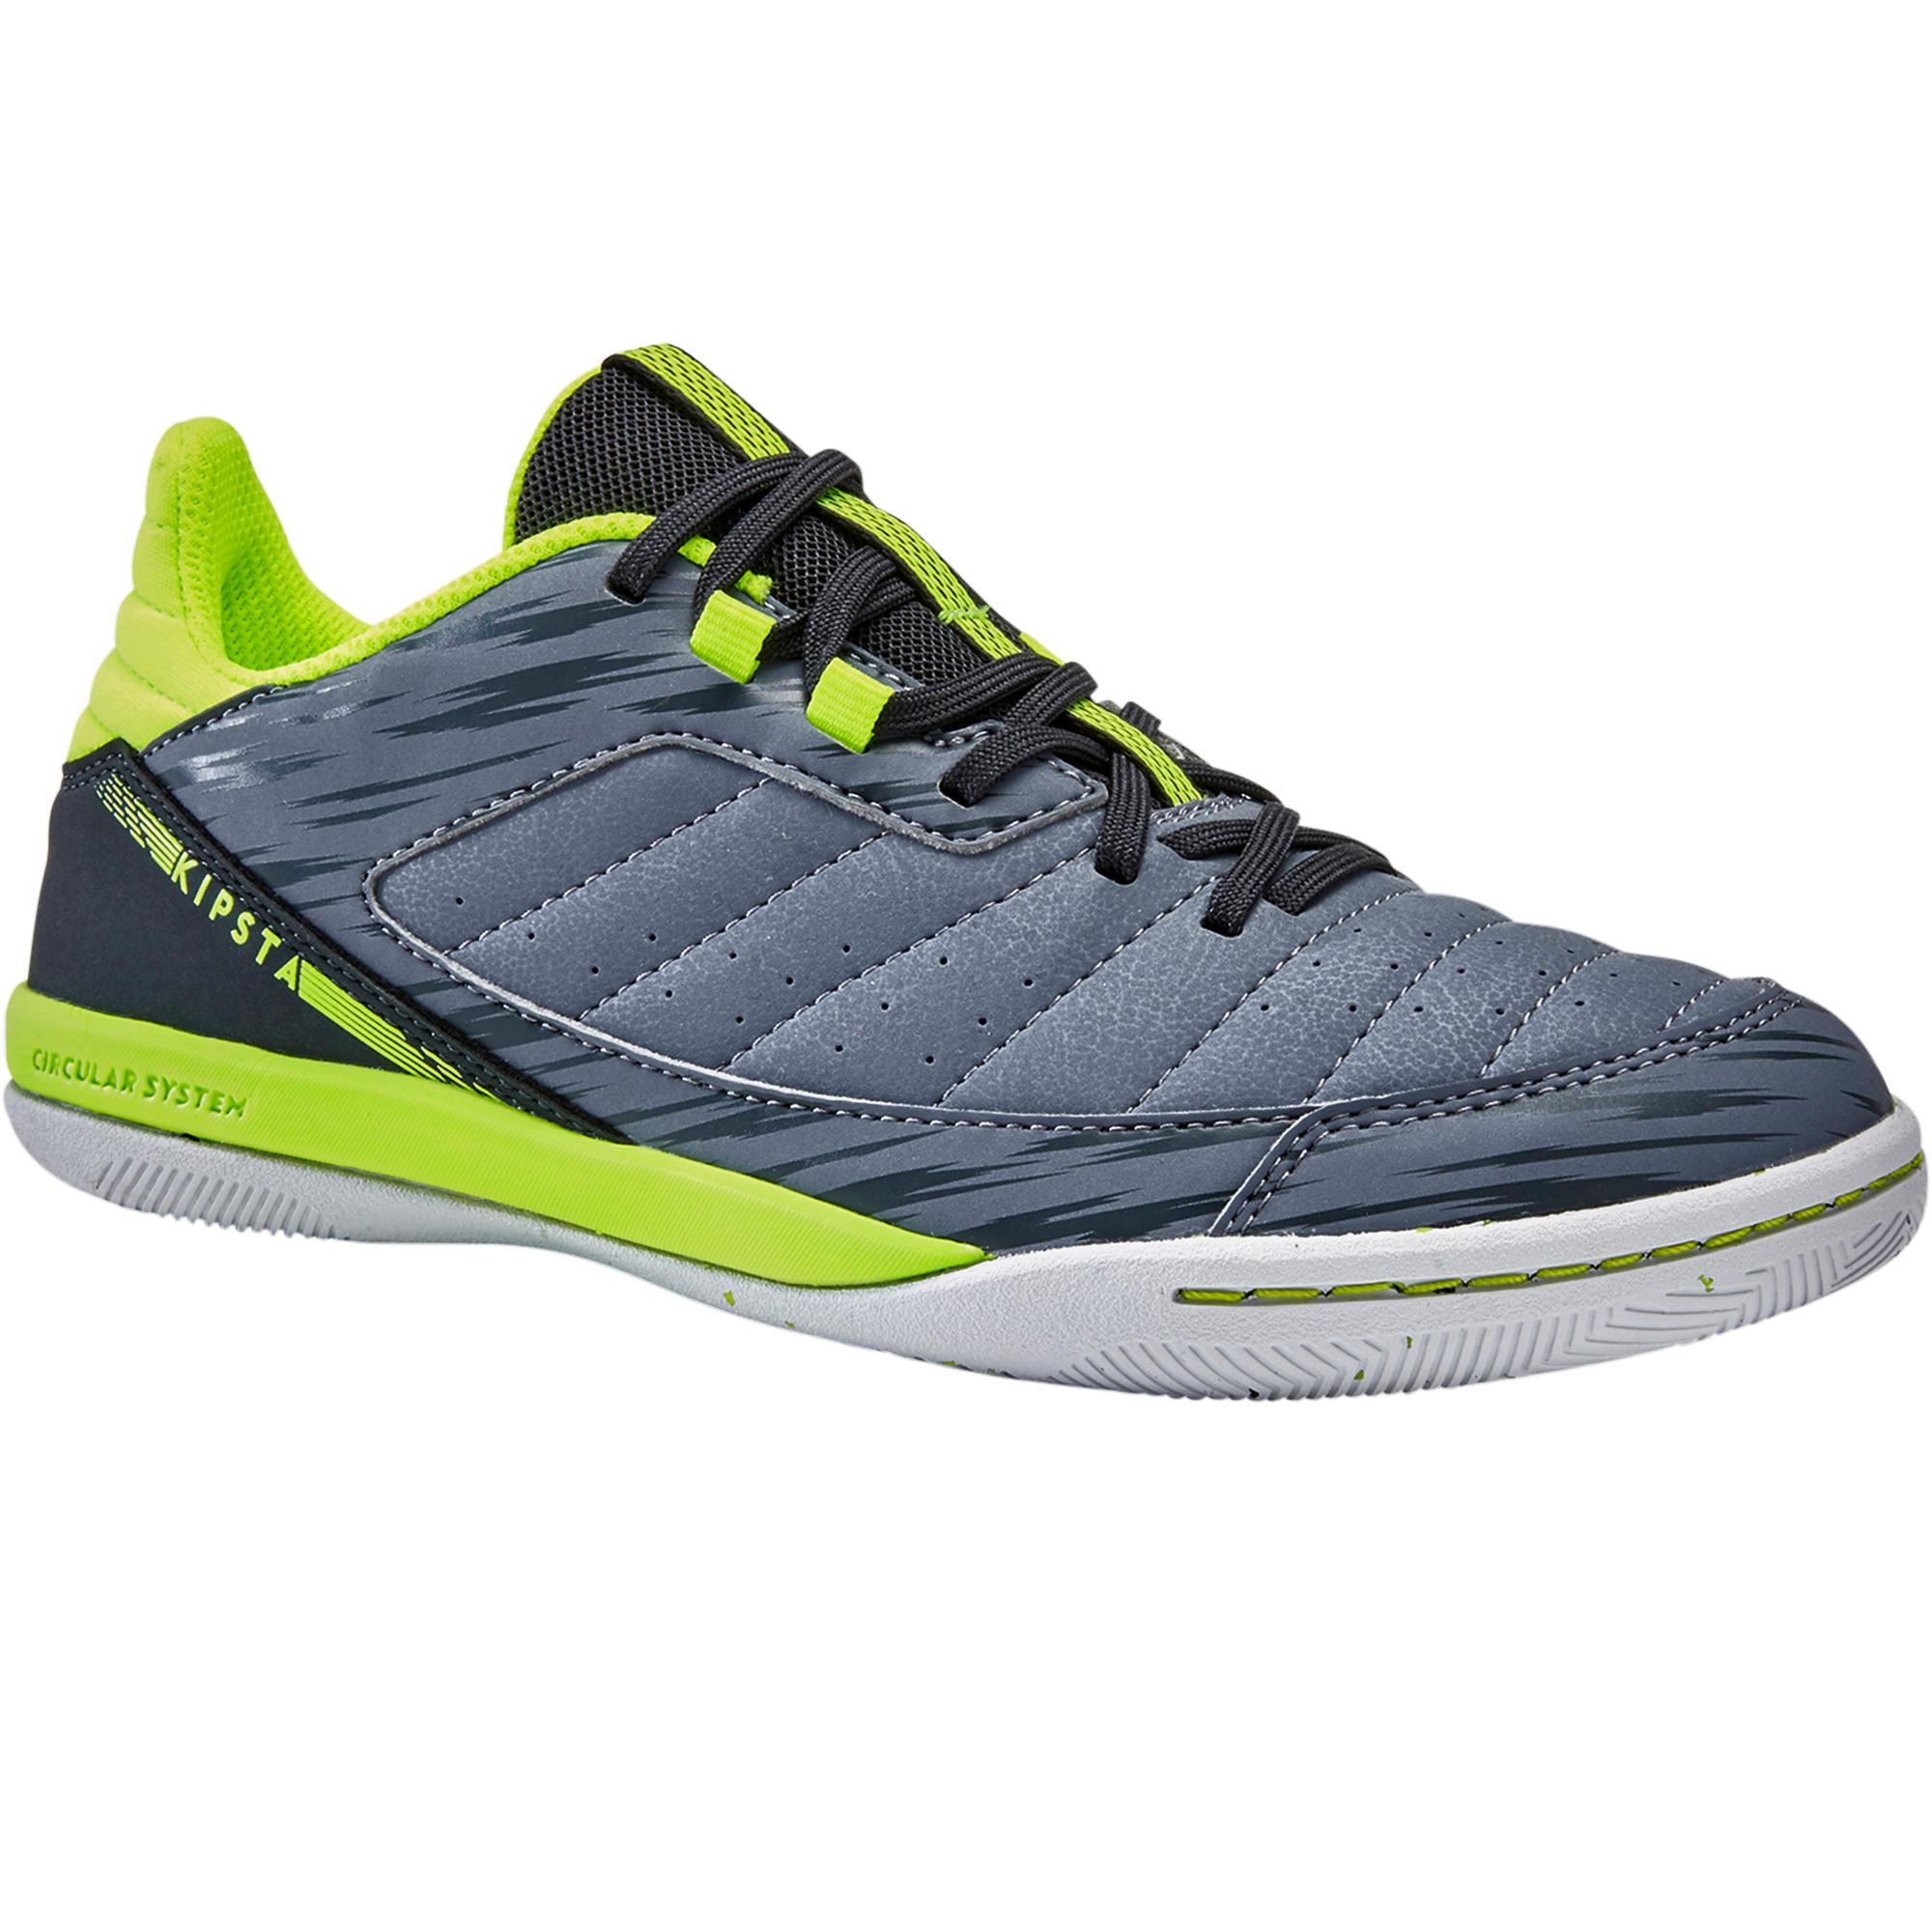 500 Chaussures Eskudo De Gris Futsal Jr 80wOPZNnkX